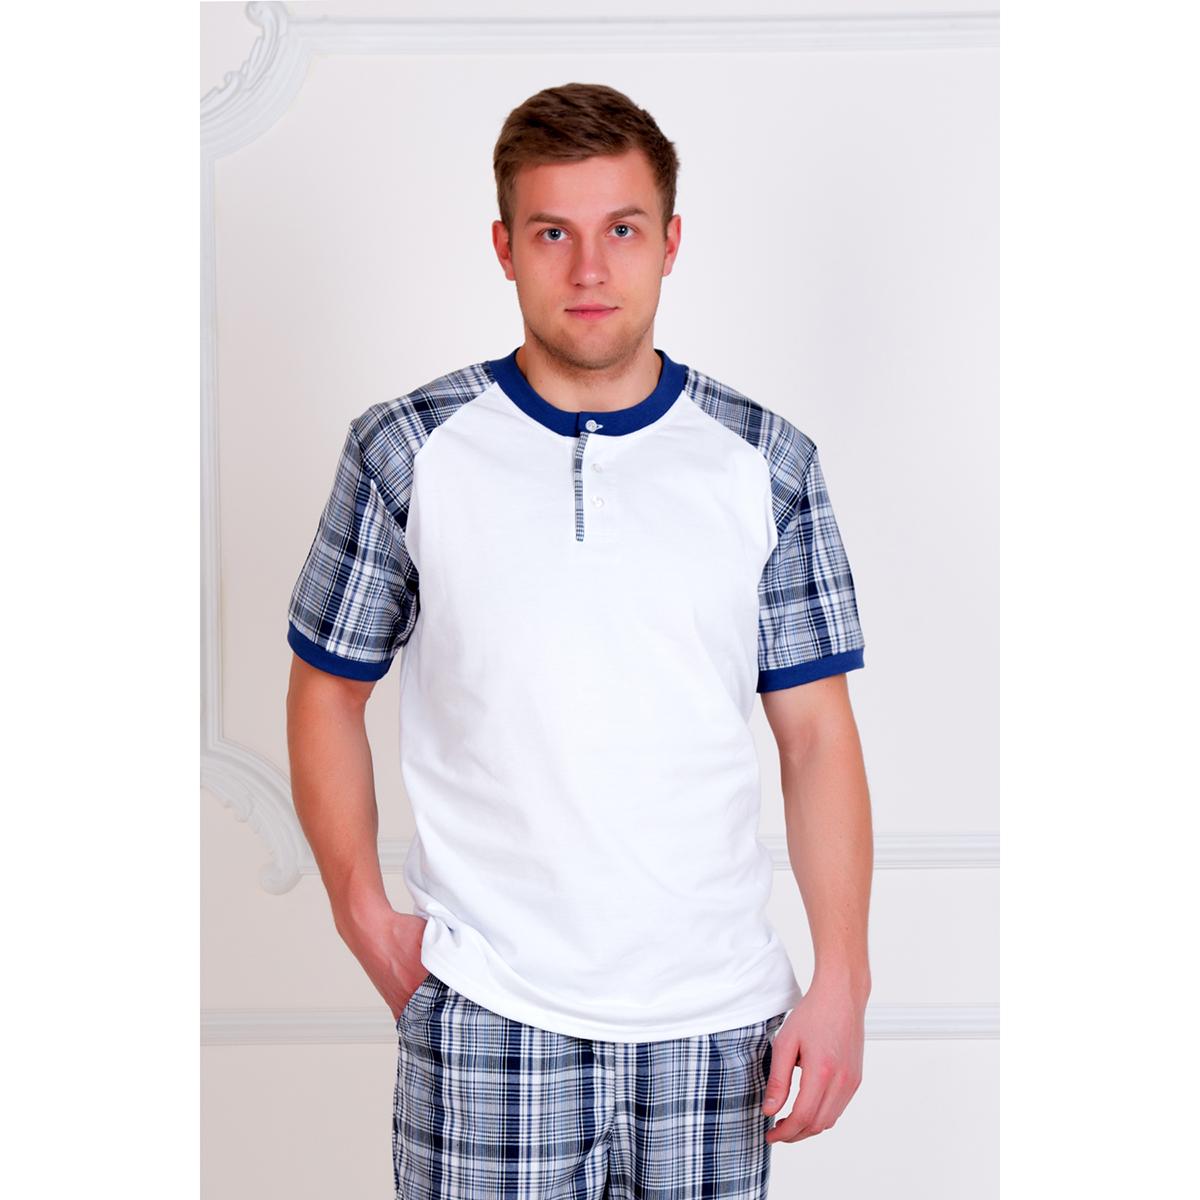 Мужской костюм Аристарх Белый, размер 44Костюмы<br>Обхват груди: 88 см <br>Обхват талии: 78 см <br>Обхват бедер: 94 см <br>Рост: 170-176 см<br><br>Тип: Муж. костюм<br>Размер: 44<br>Материал: Пике